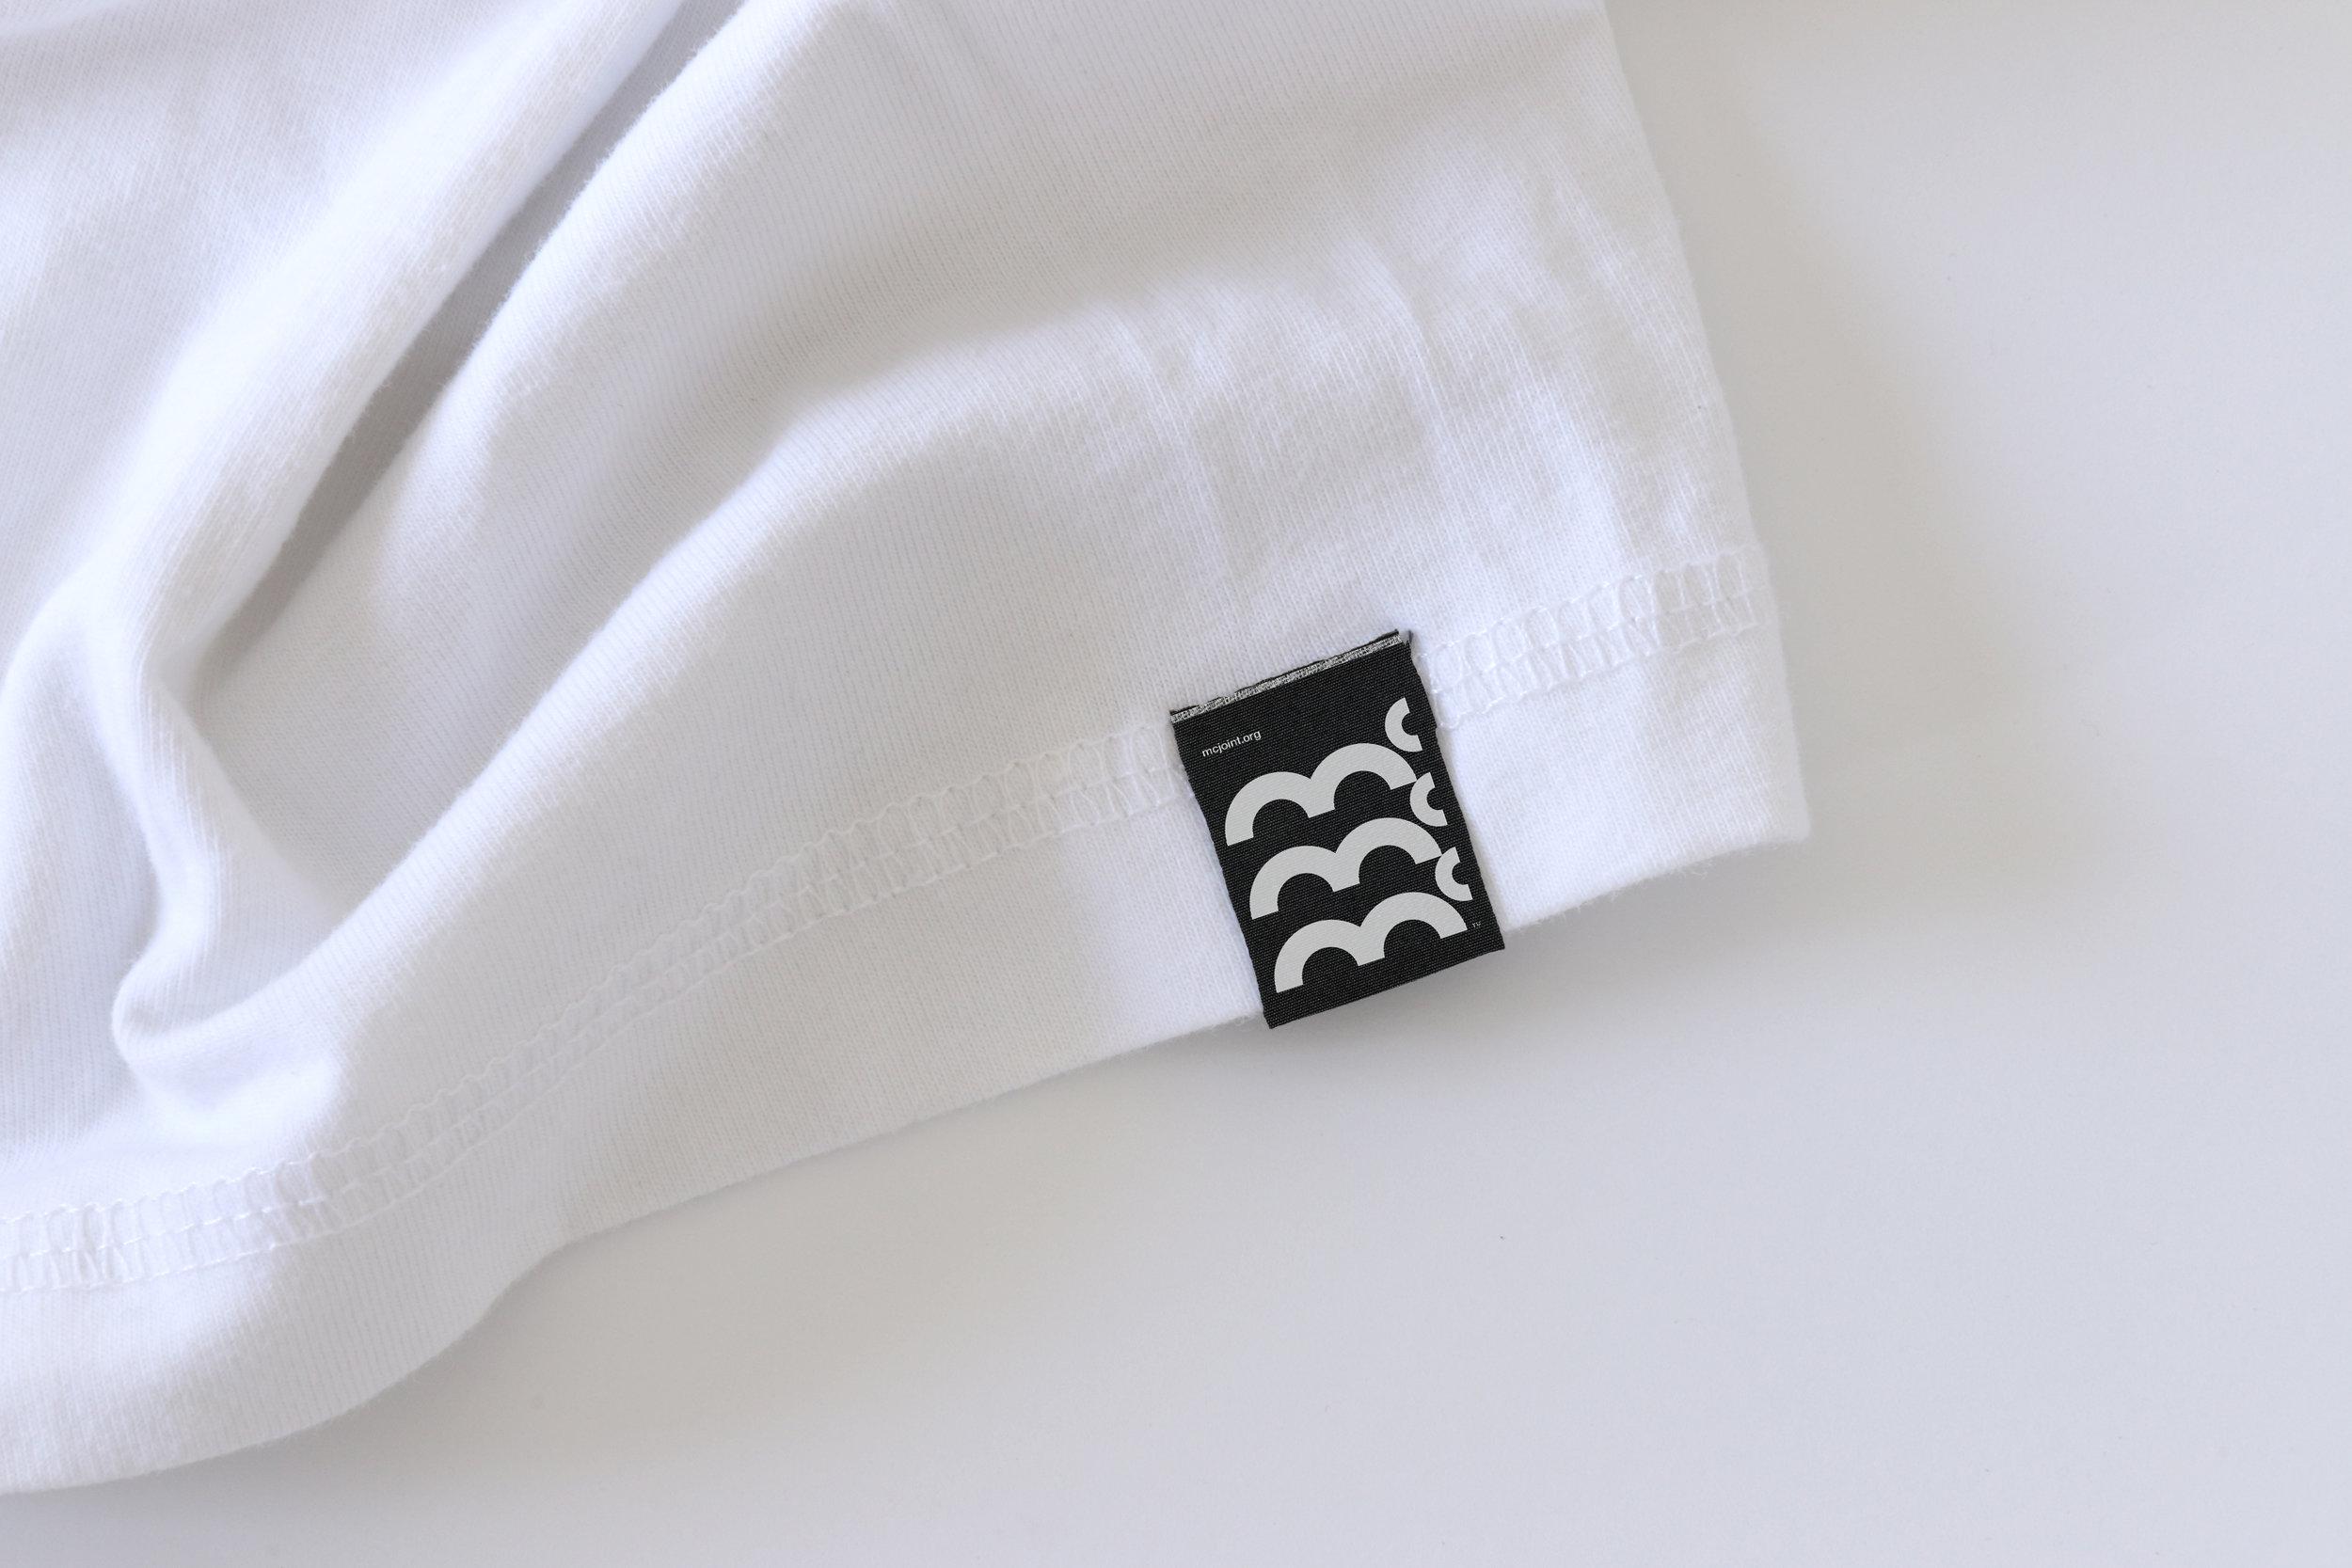 3D_Mc_shirt-tag_3_3000w.jpg